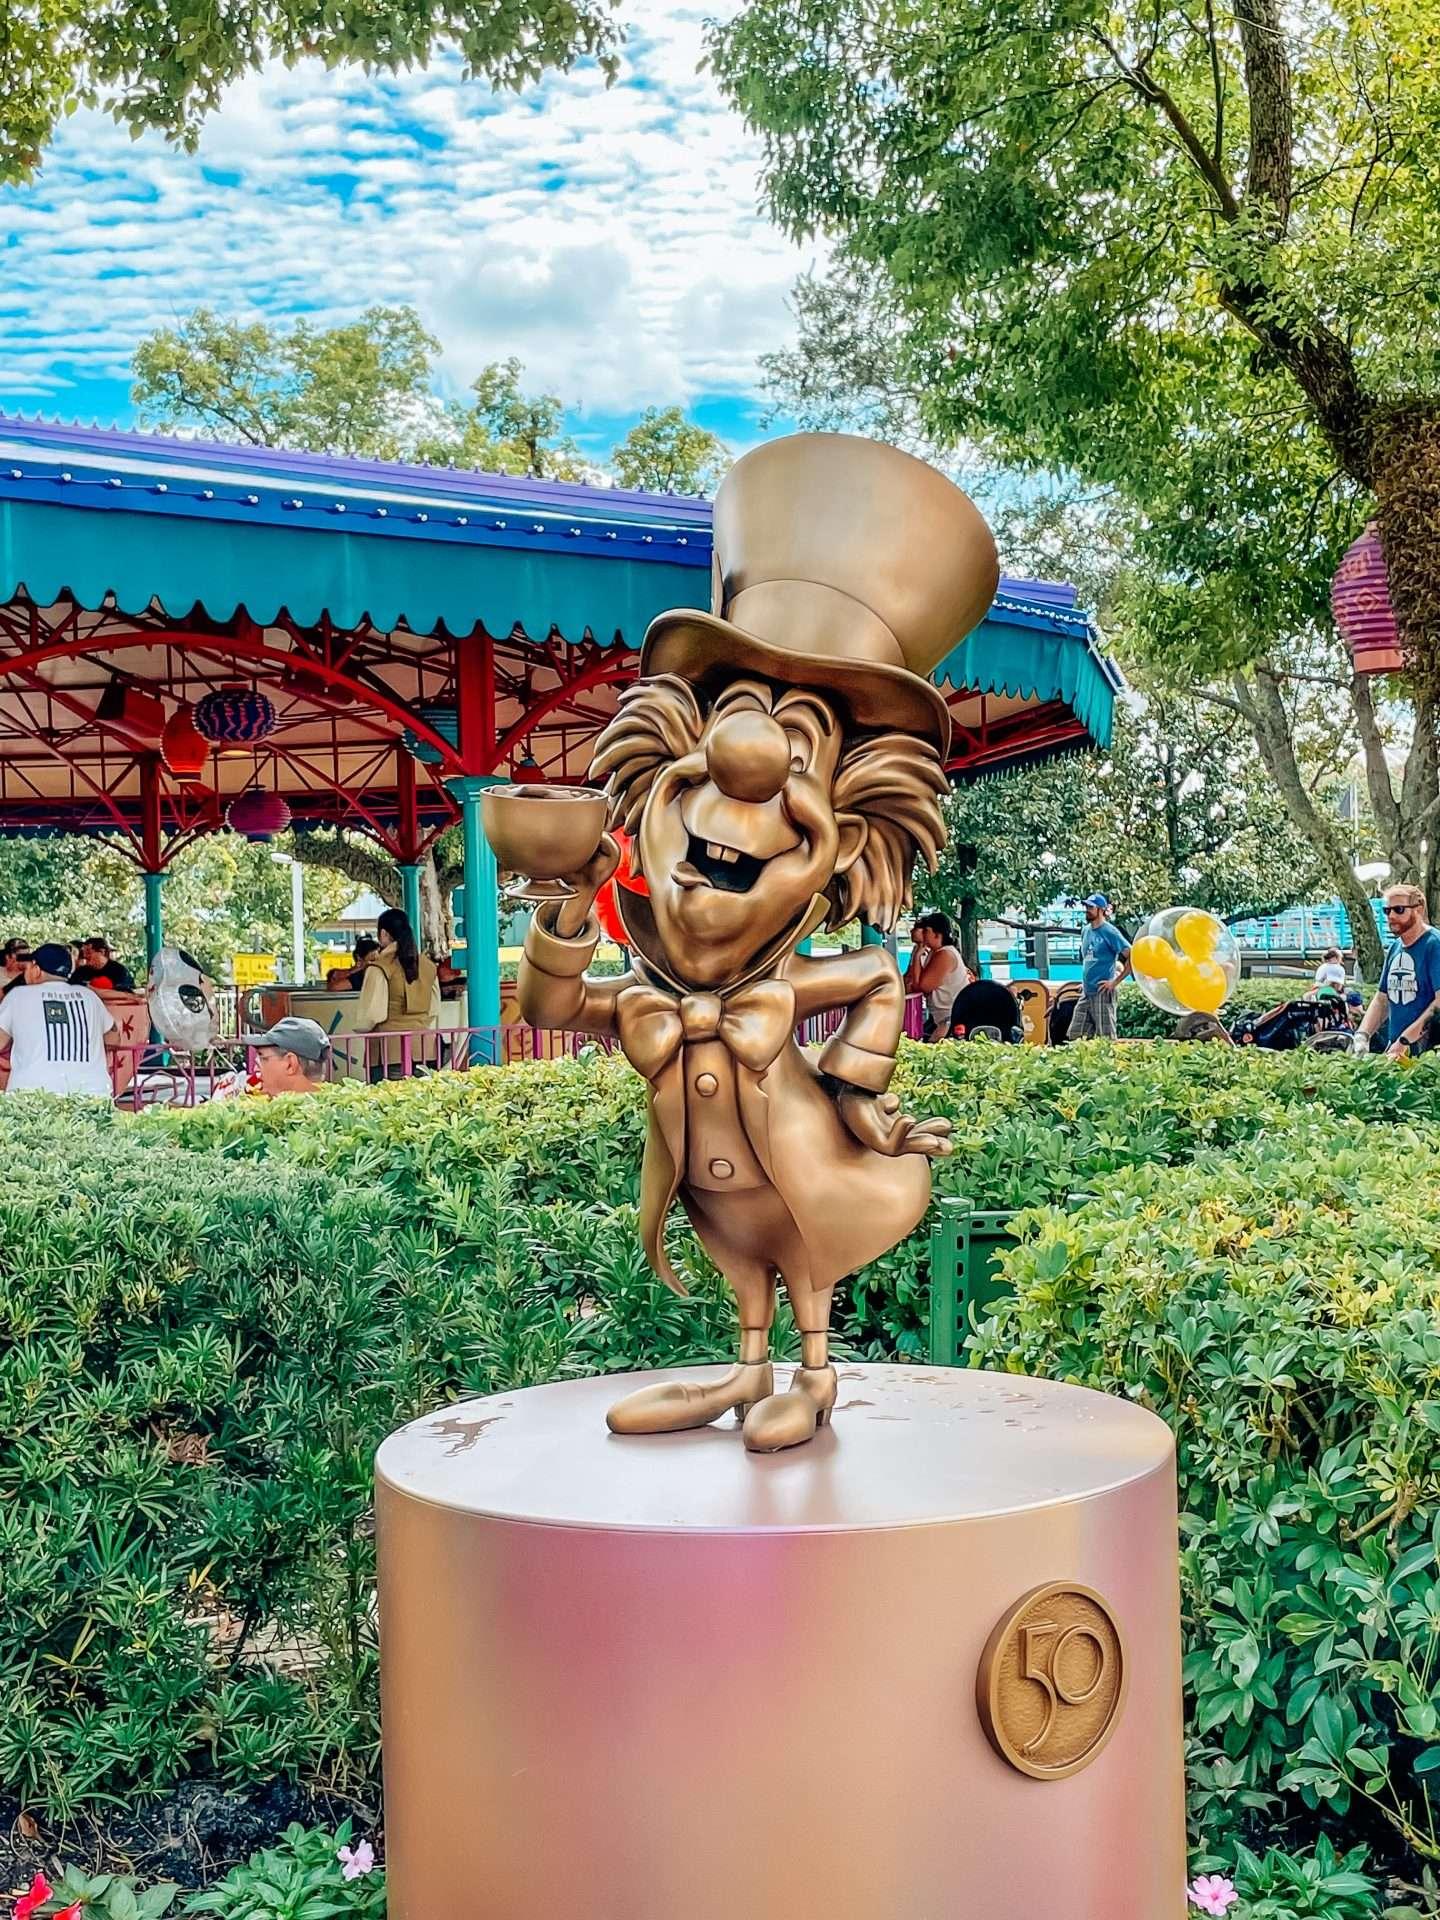 50th Anniversary Disney Statues at Magic Kingdom